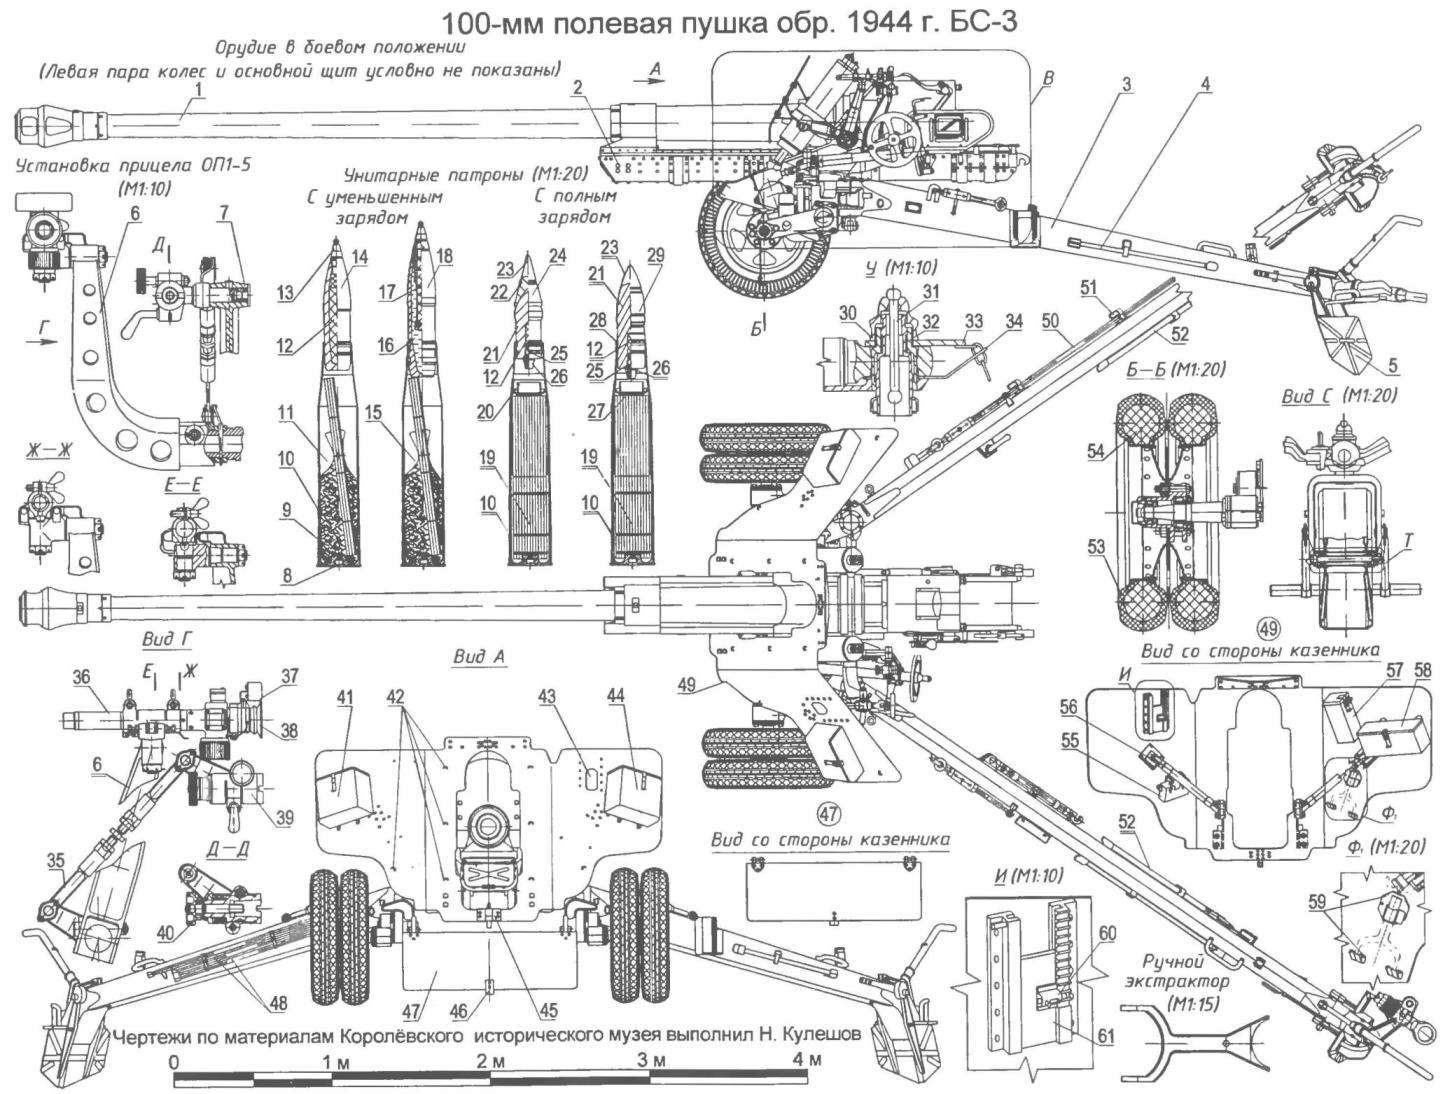 100-мм полевая пушка БС-3 обр. 1944 г.